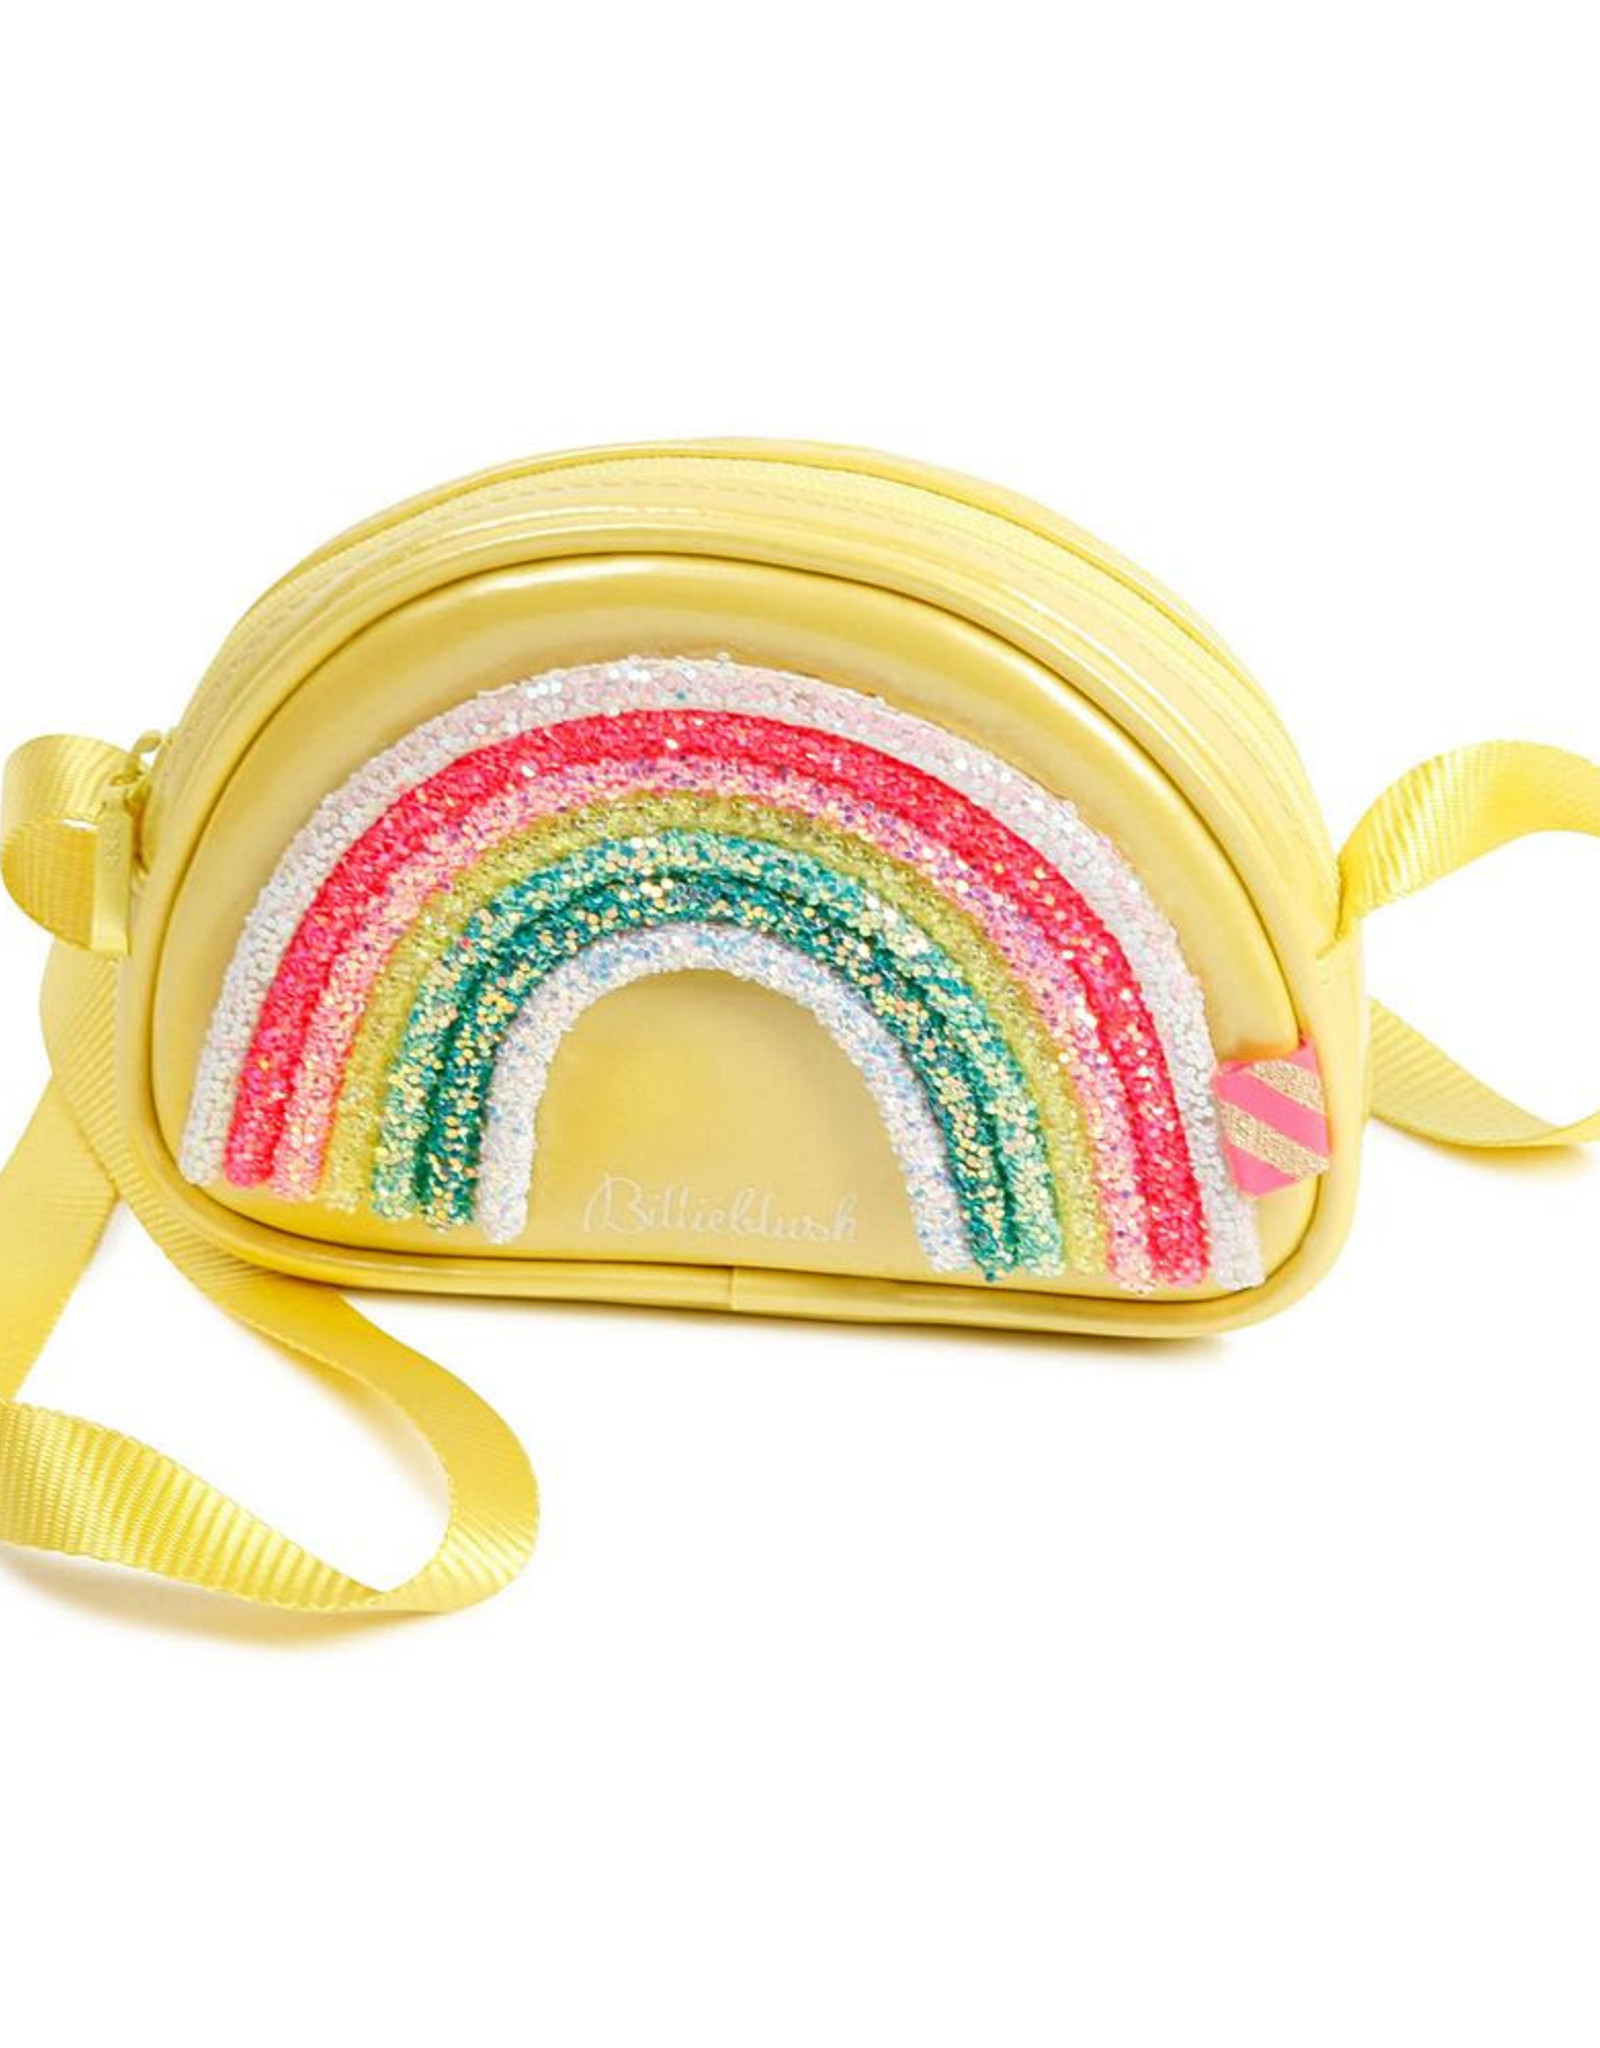 Billieblush Billieblush Rainbow Handbag